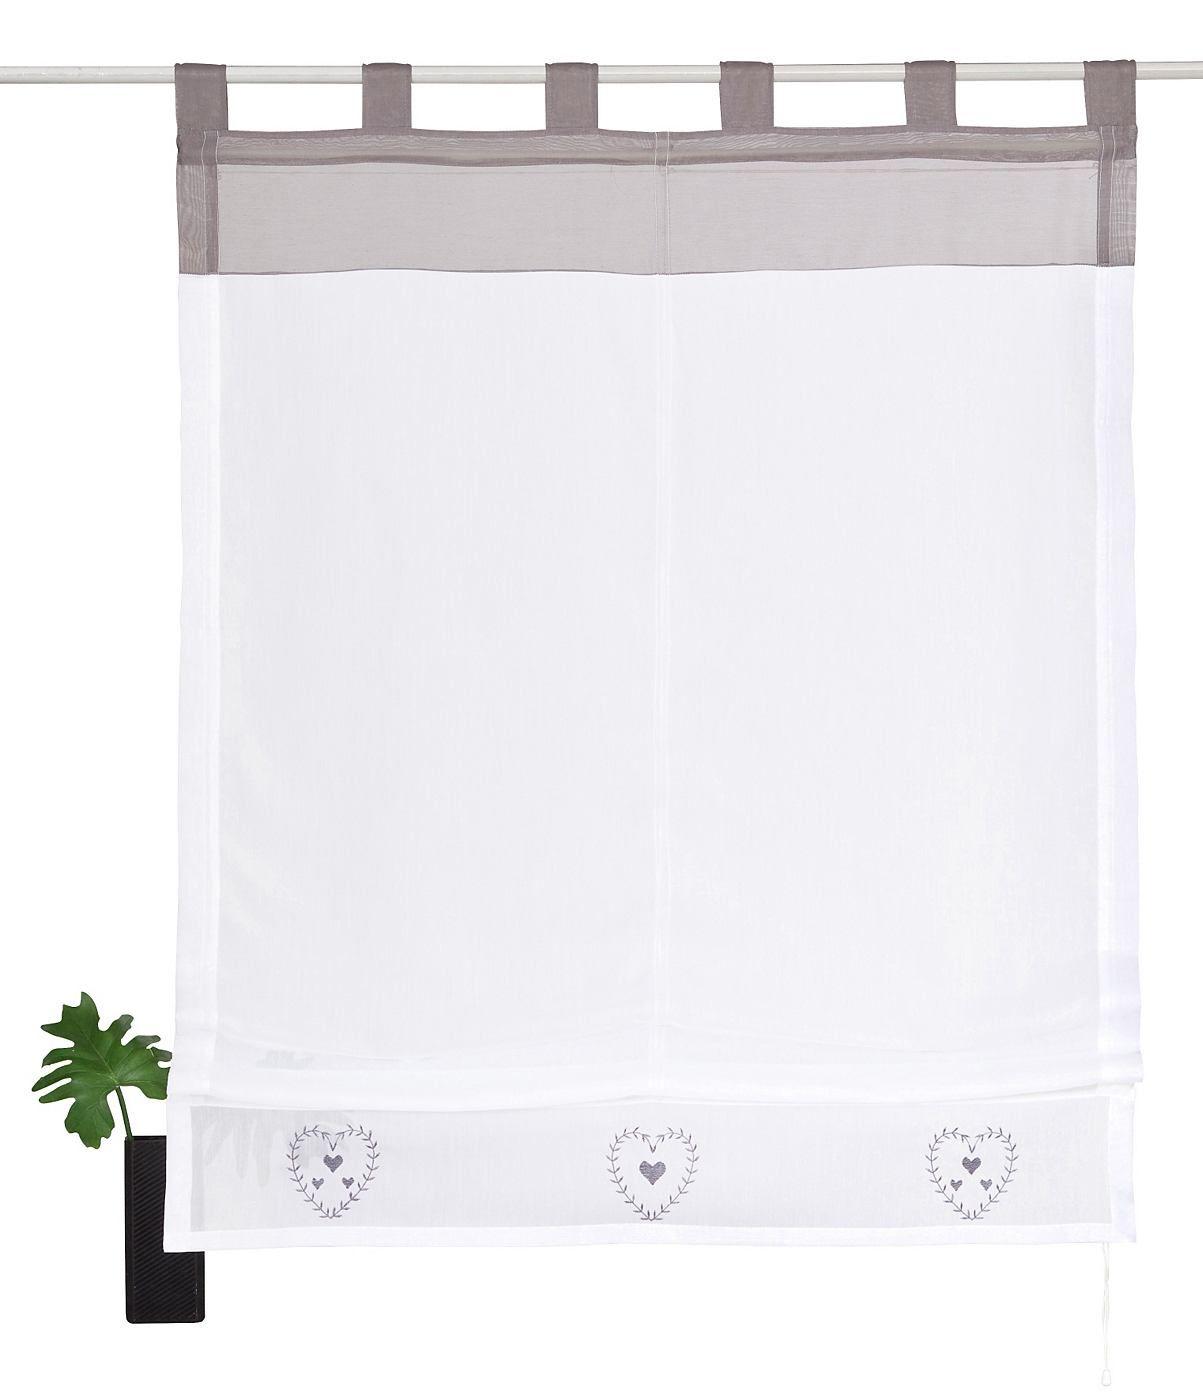 raffrollo f r fensterrahmen icnib. Black Bedroom Furniture Sets. Home Design Ideas